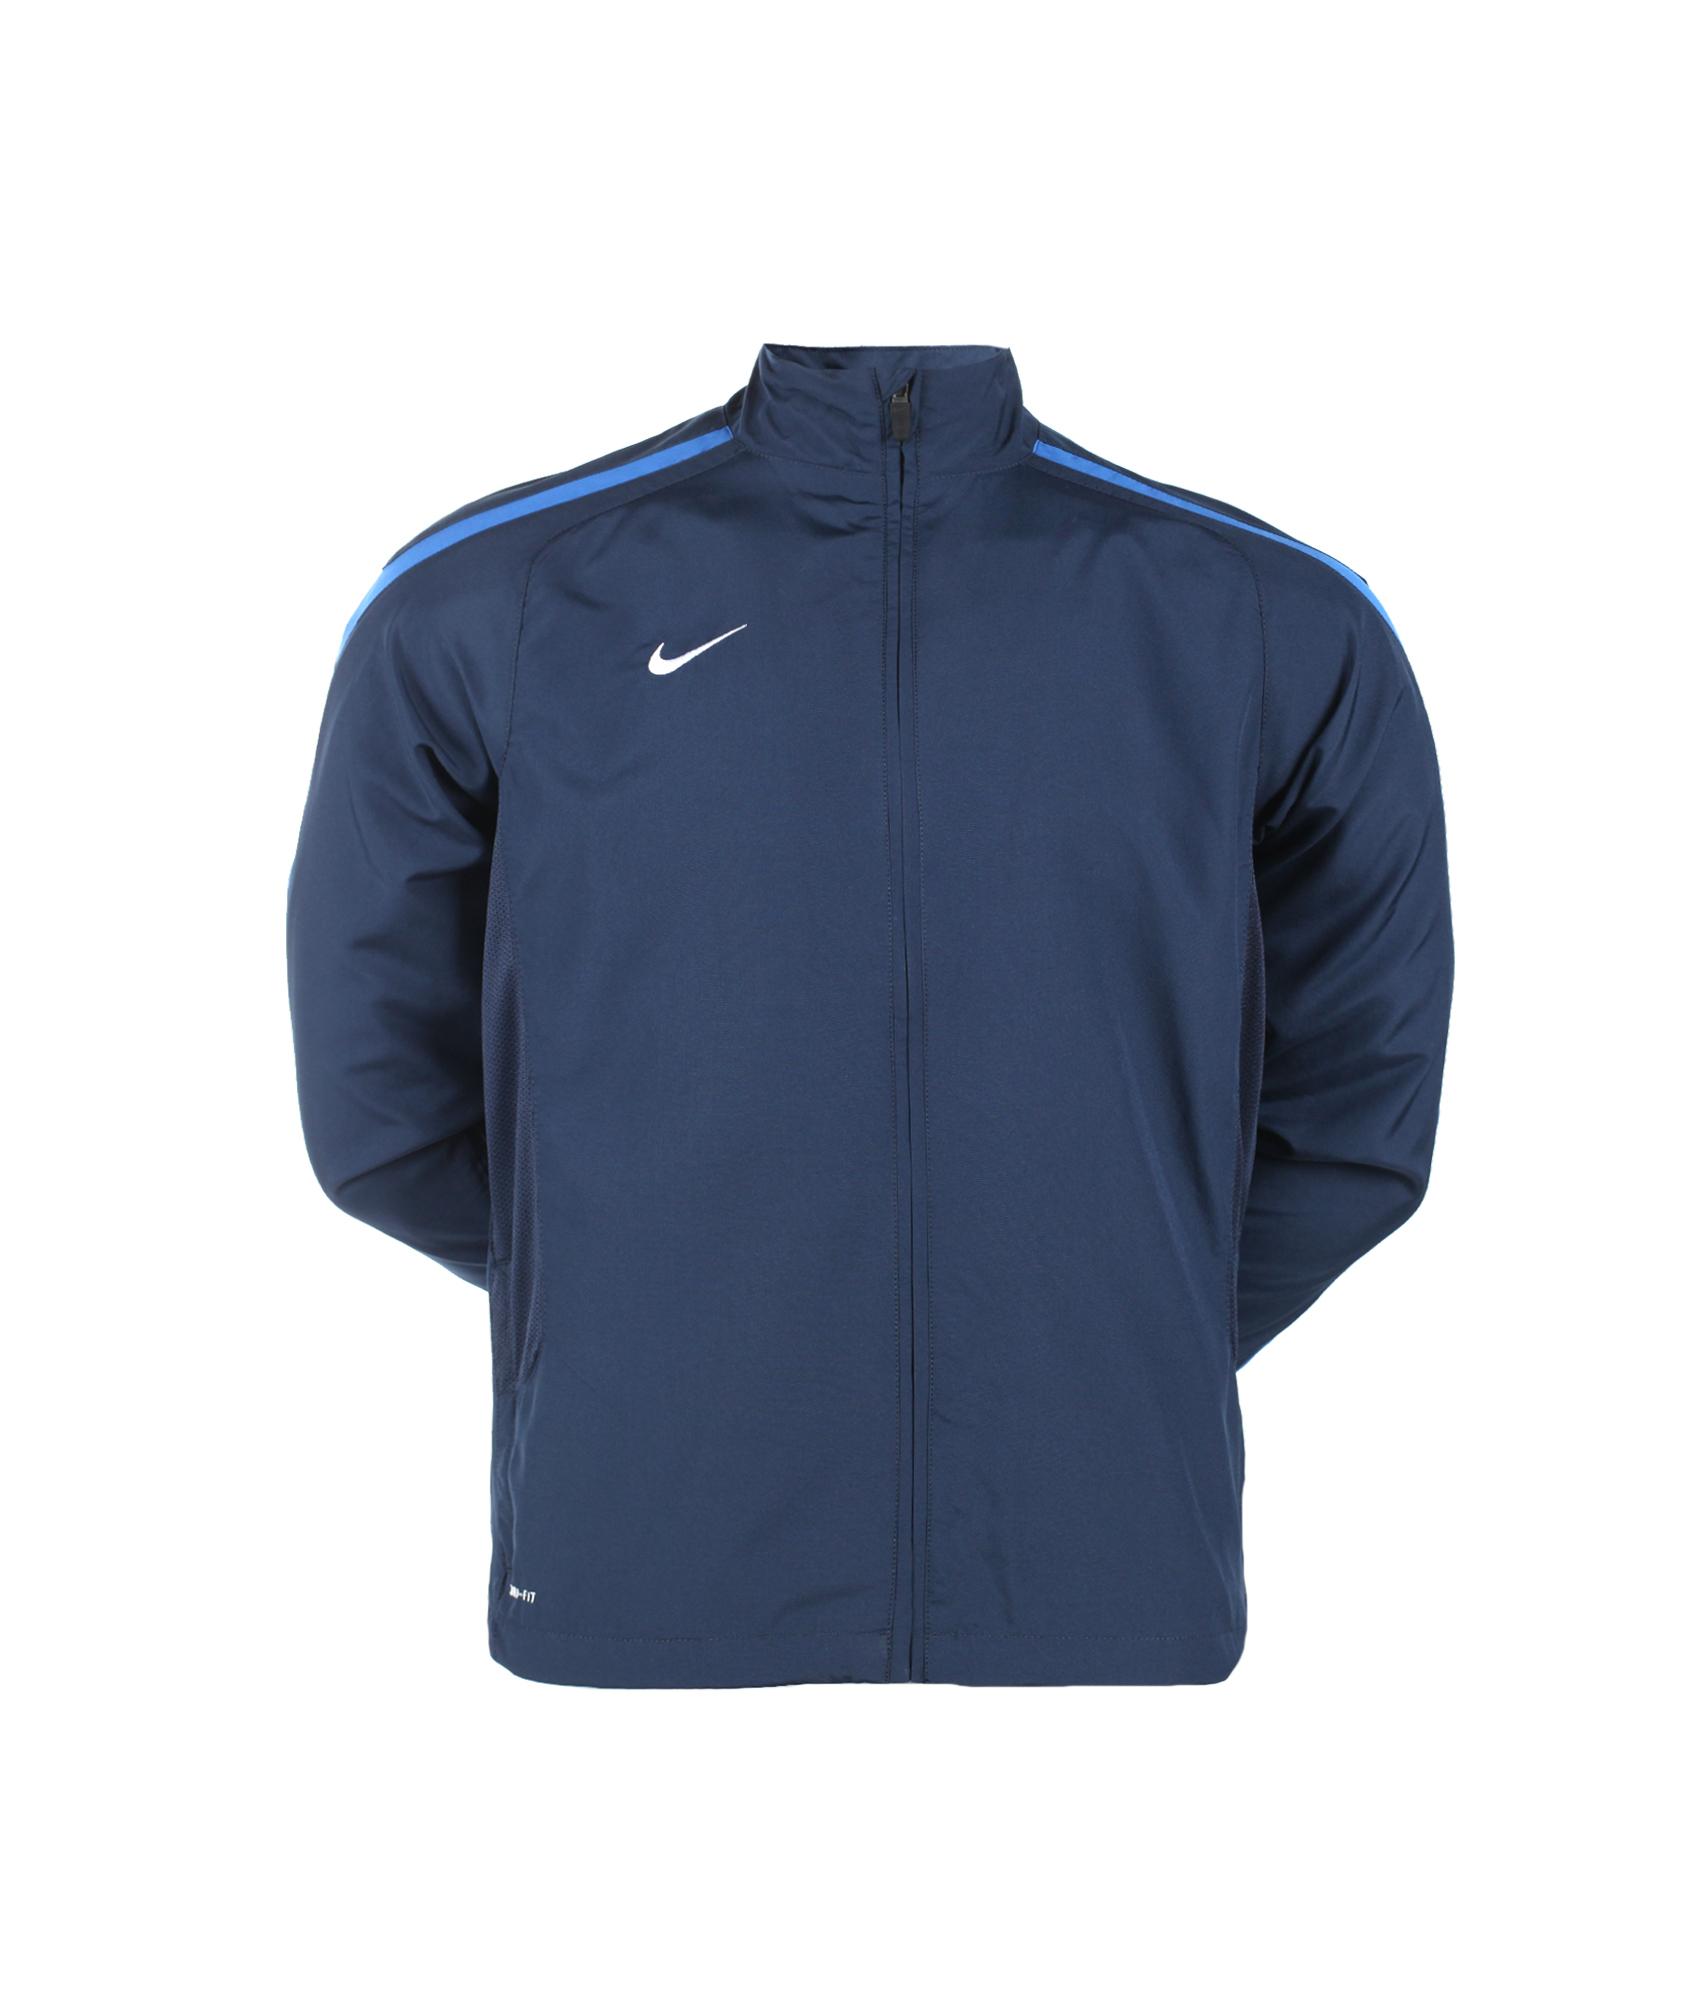 Куртка Nike BOYS COMP 11, Цвет-Темно-Синий, Размер-S